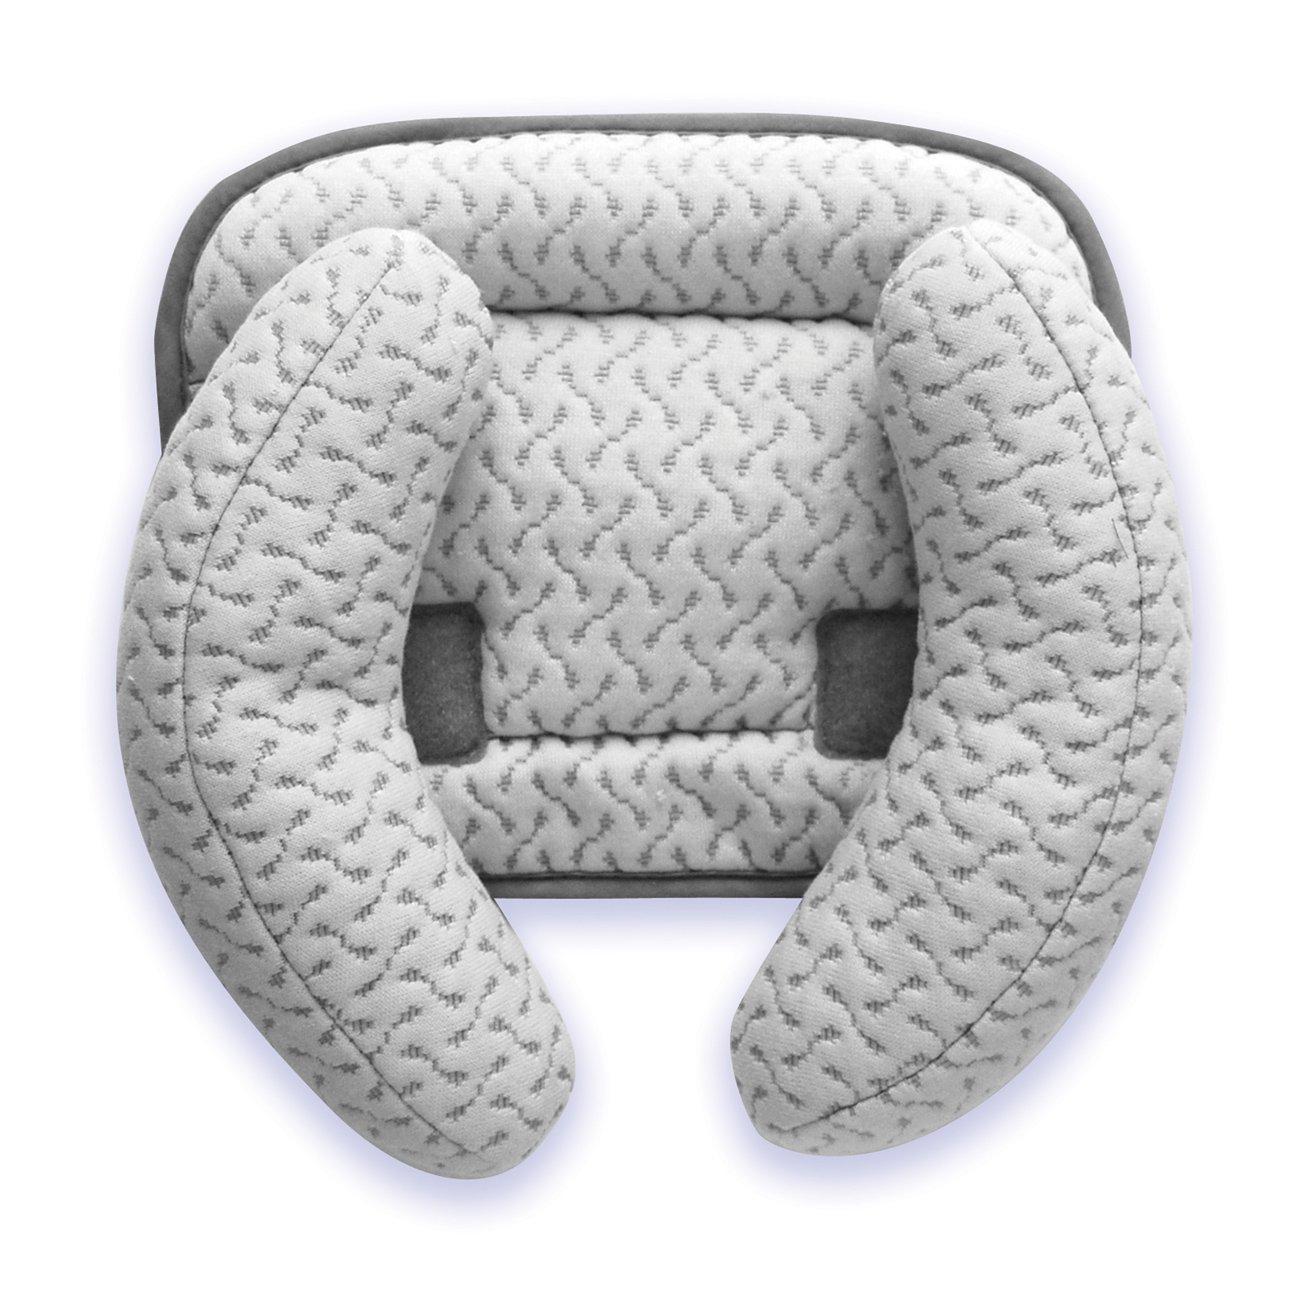 Serta iComfort Premium Head Support, Grey Baby' s Journey 3816